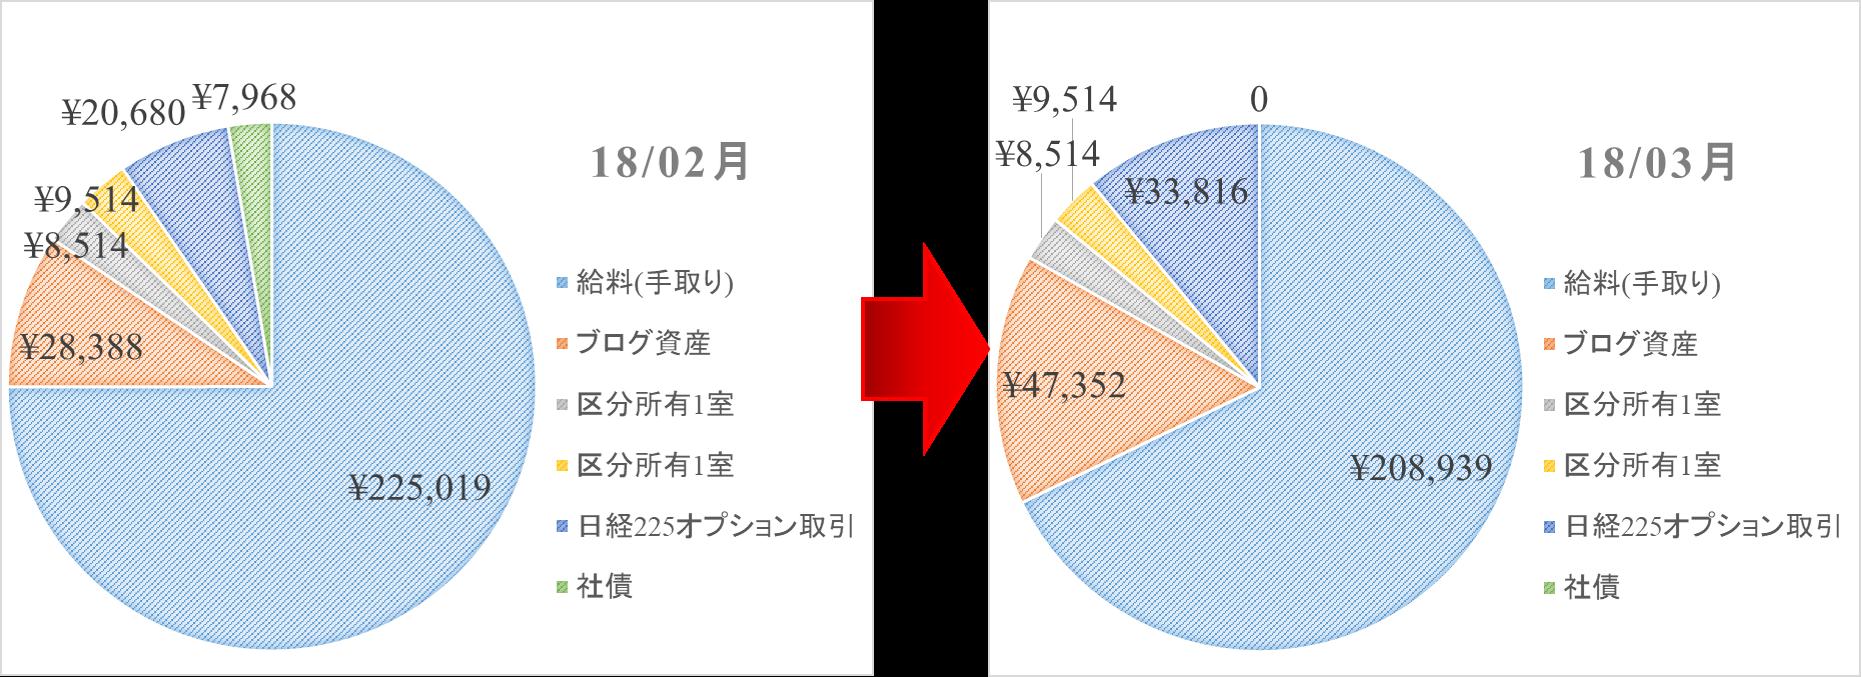 180401-1